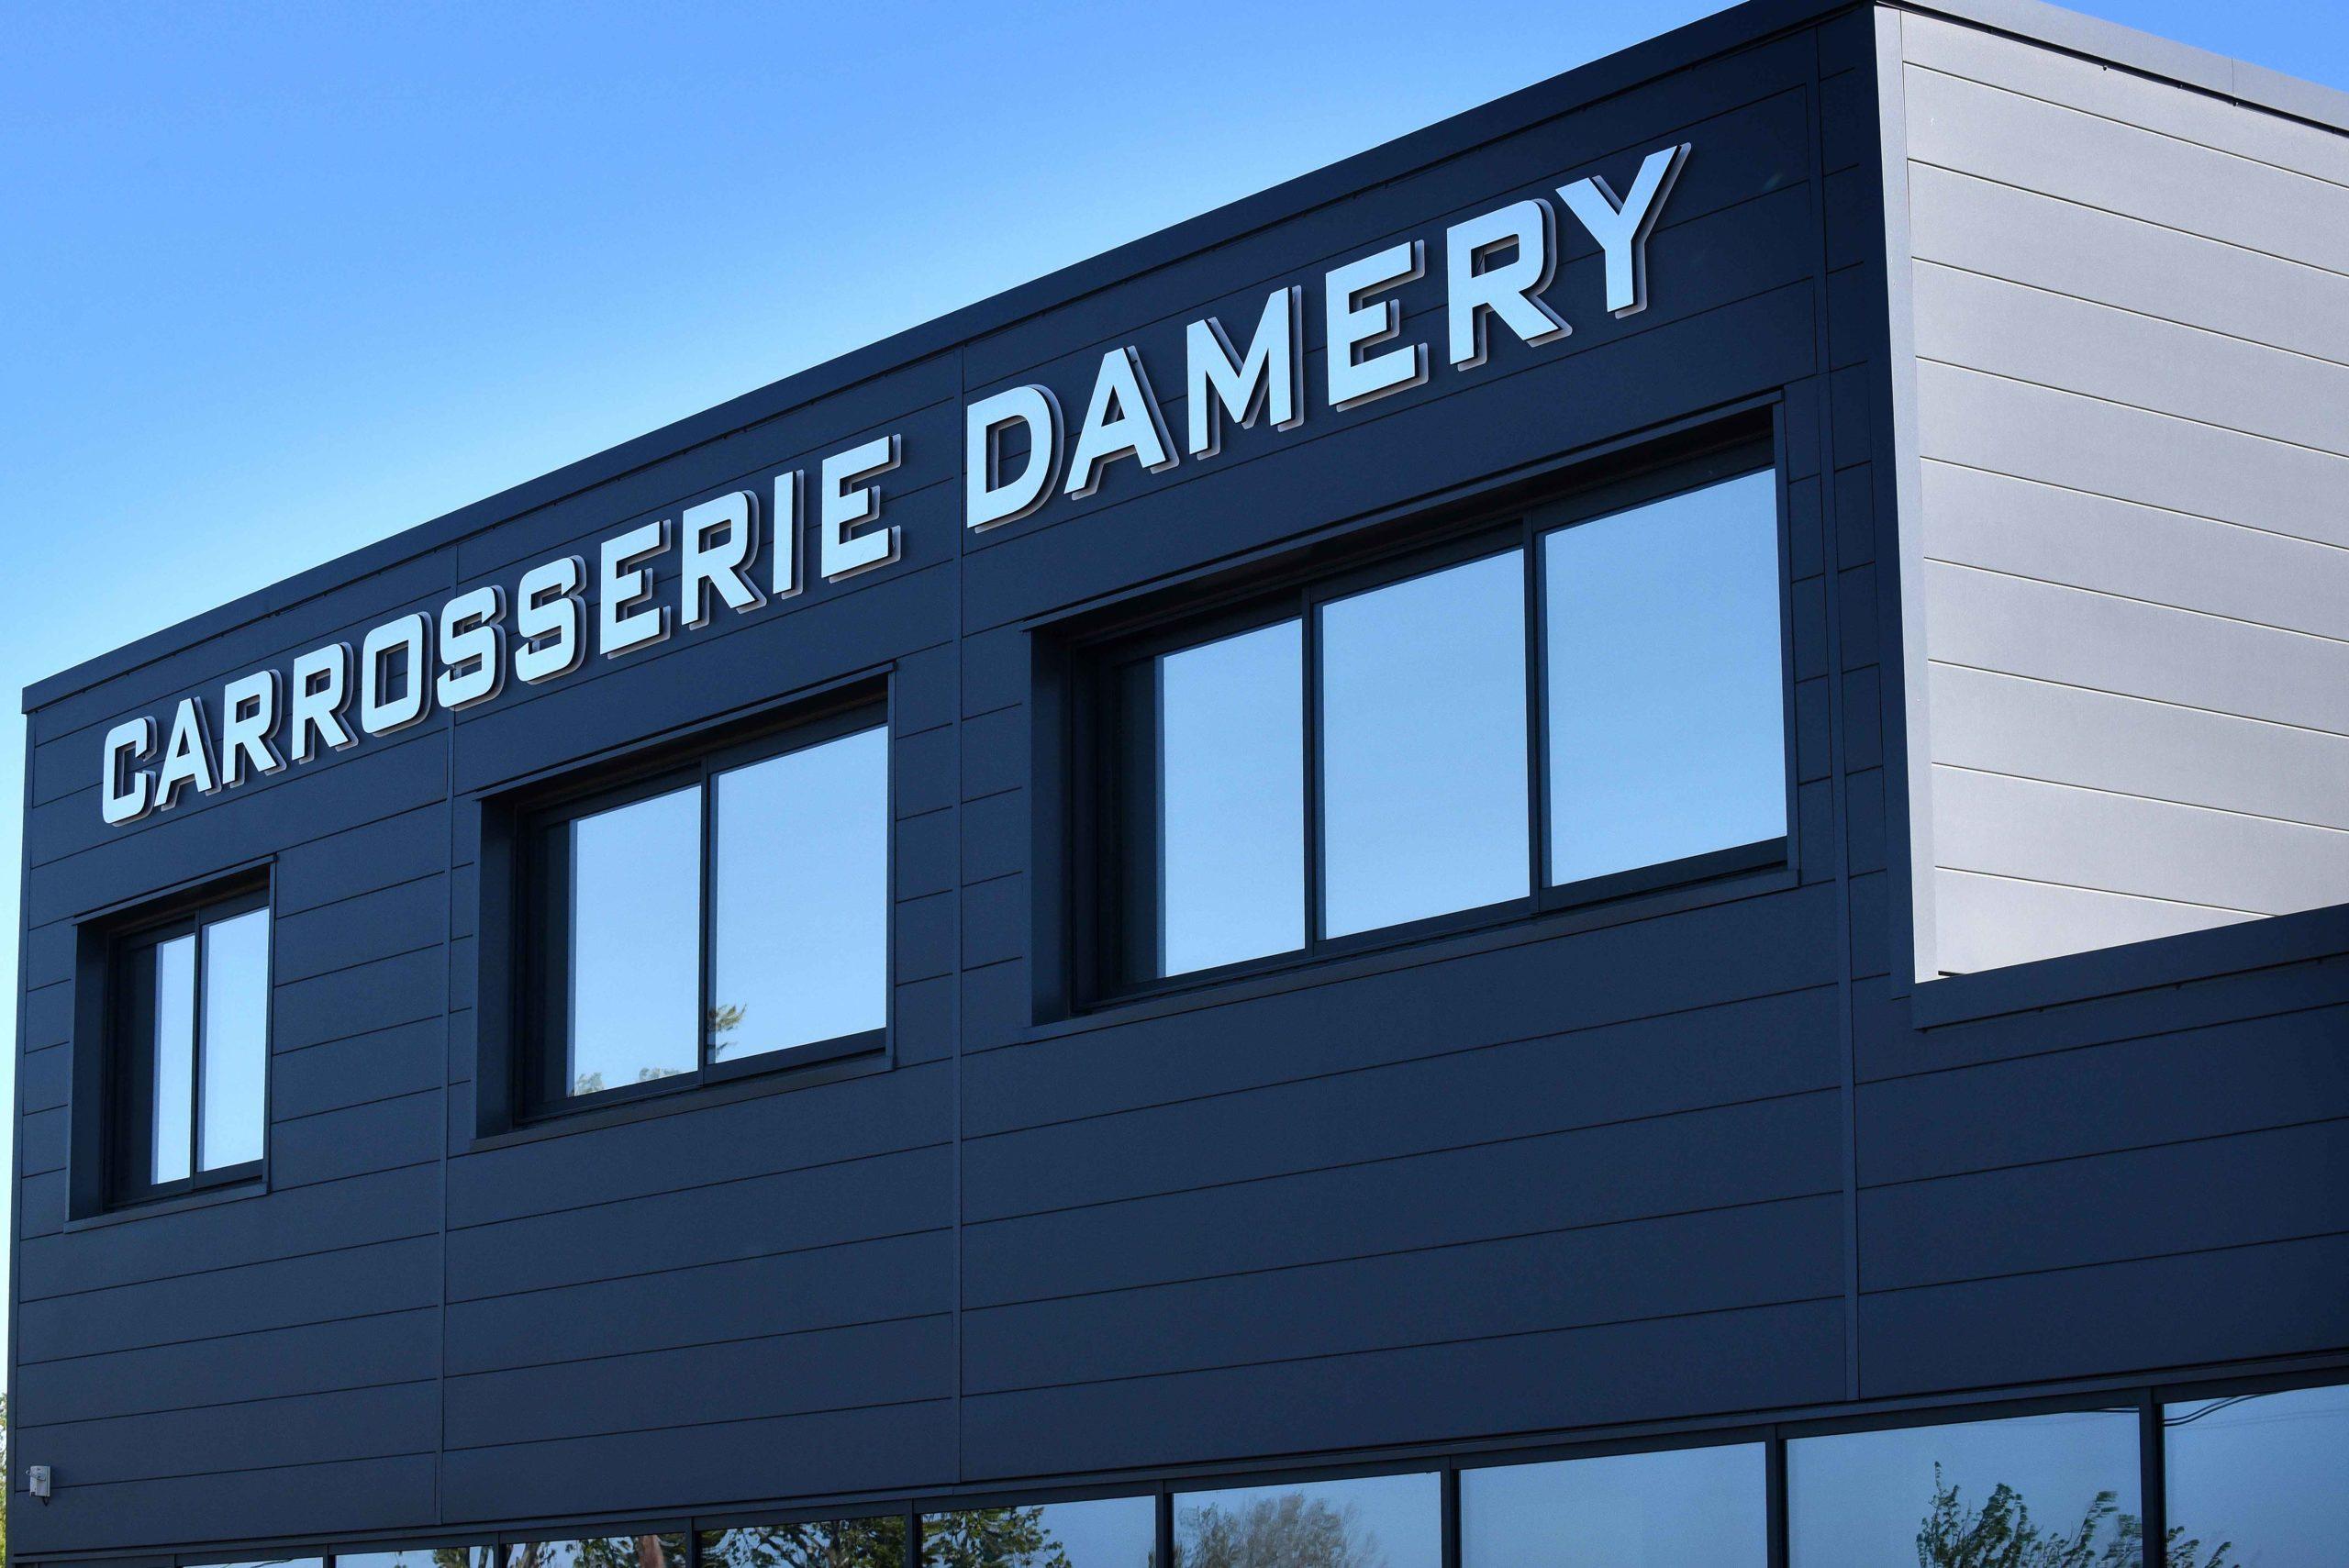 Création site internet vitrine Carrosserie Damery